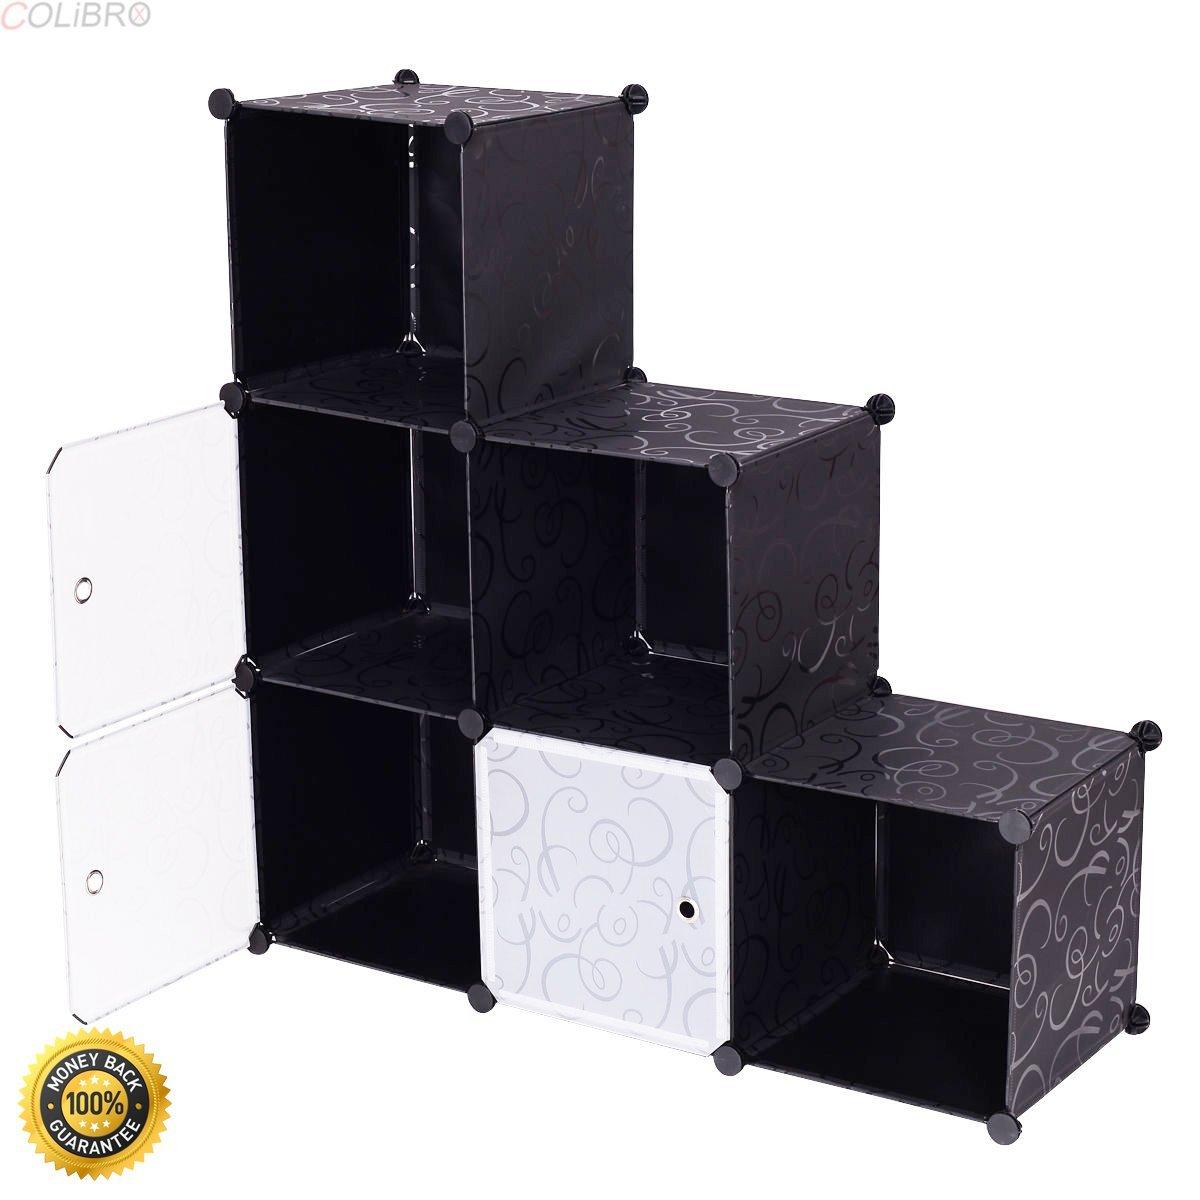 COLIBROX--3 Tier 6 Cubic Bookcase Storage Cabinet Shelf Closet Organizer Home Furniture,folding shelves bookcase,bookshelves furniture,bookshelves cheap,home depot bookcases,6 cubic Bookcase